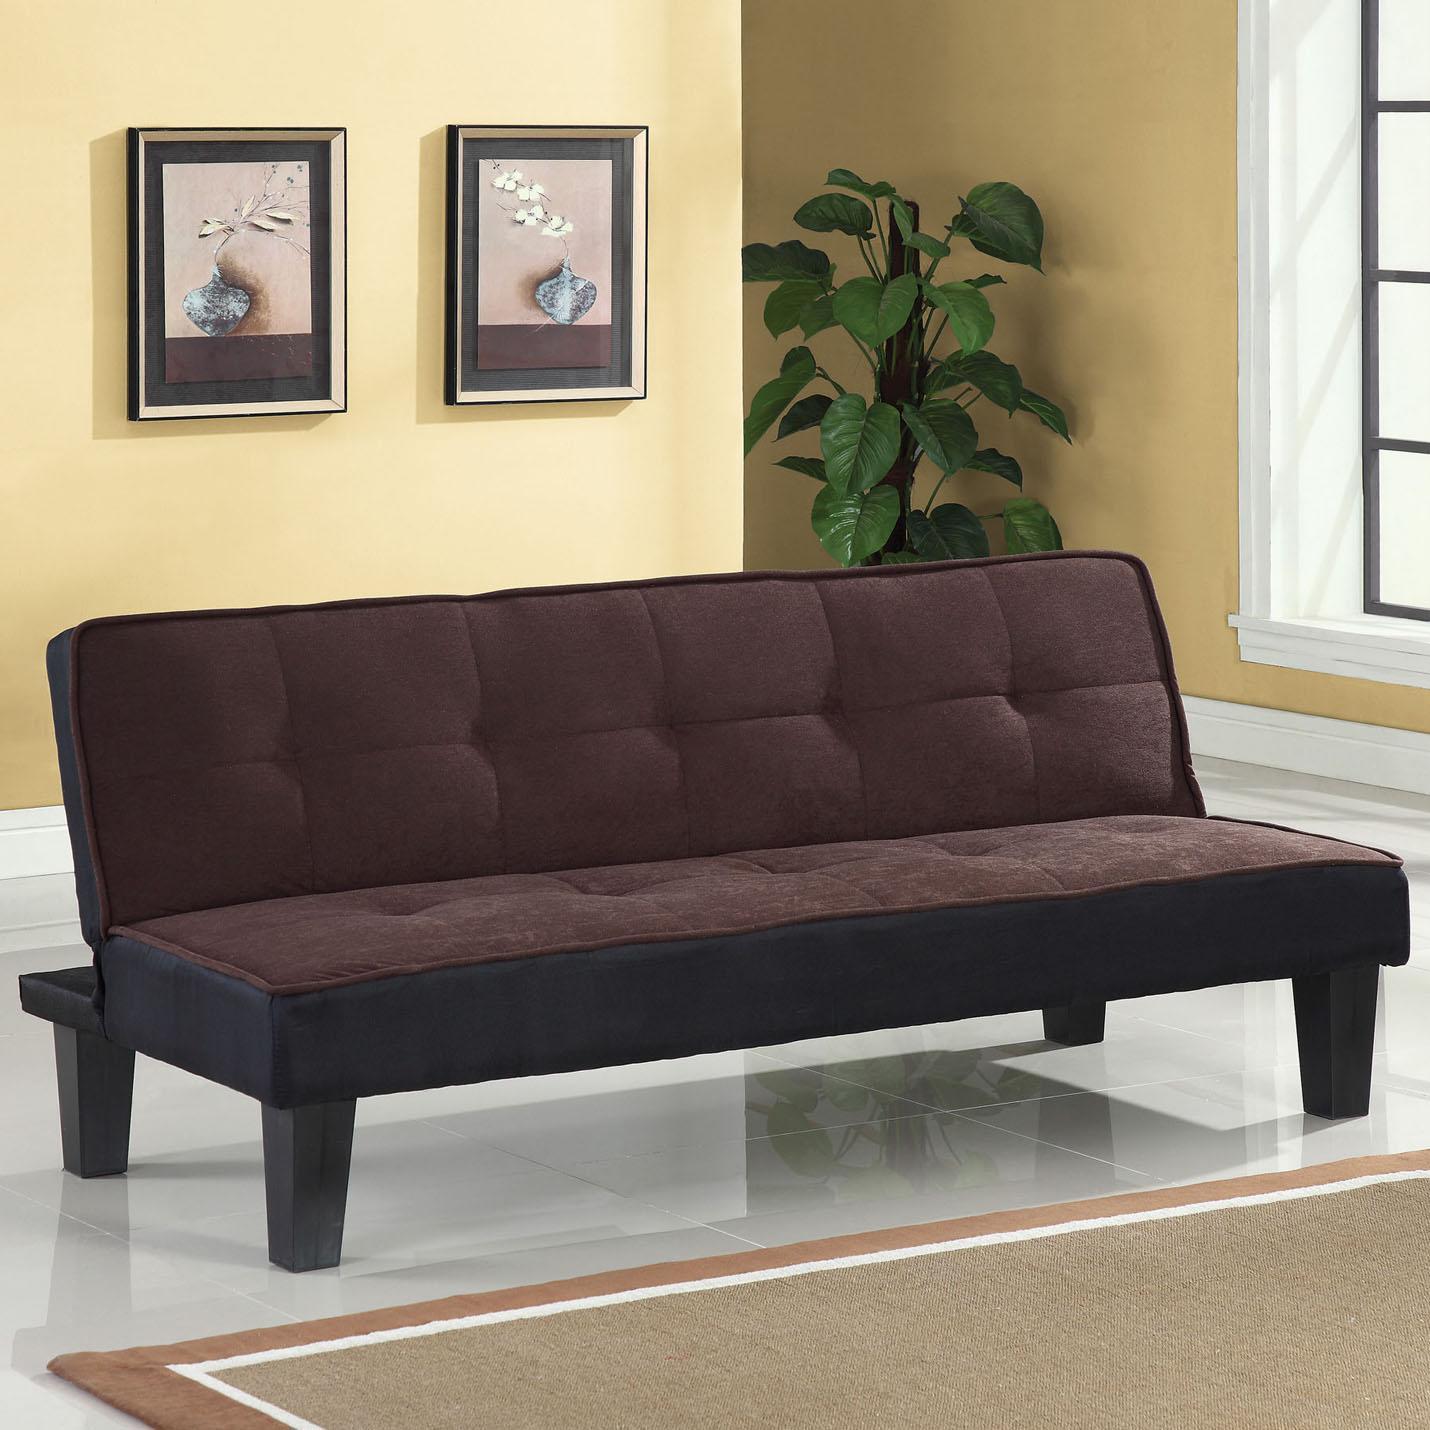 Acme Furniture Hamar Adjustable Sofa - Item Number: 57028